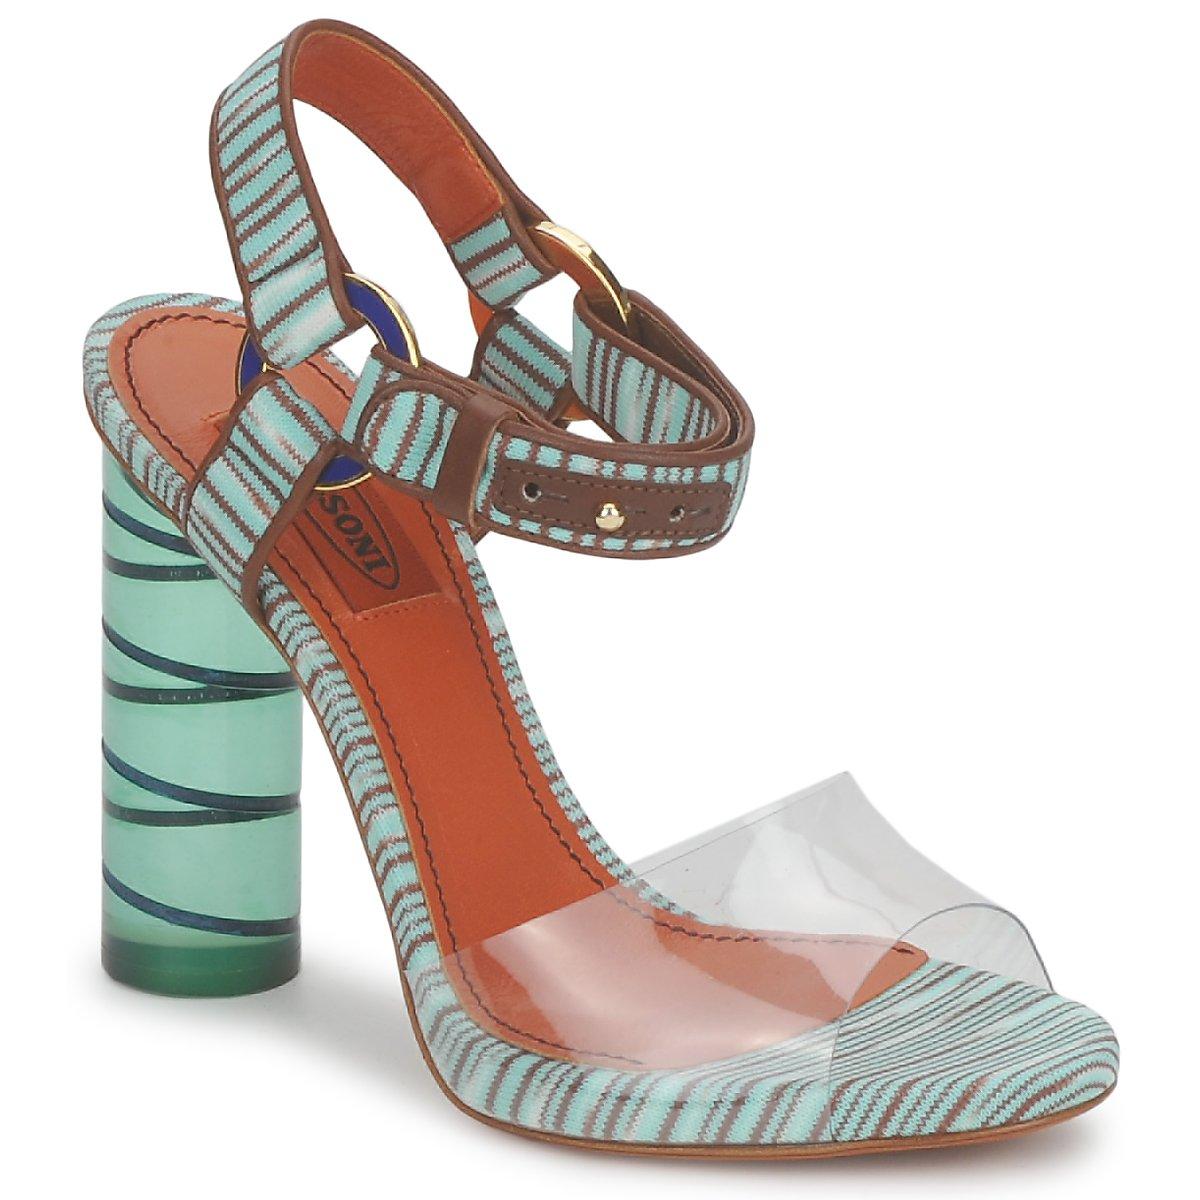 Sandale Missoni TM63 Eau